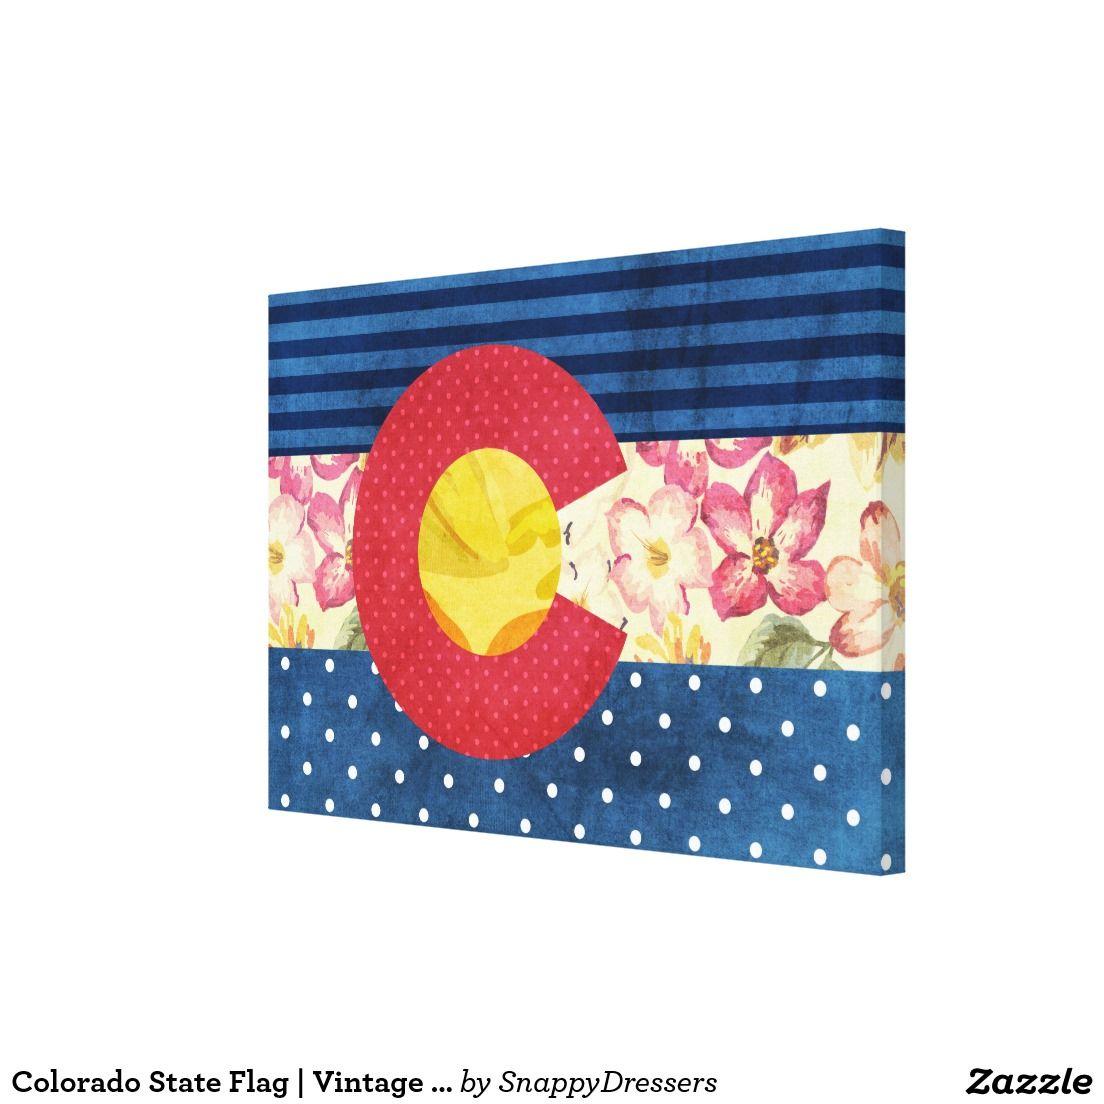 Colorado State Flag | Vintage Shabby Chic Canvas Print